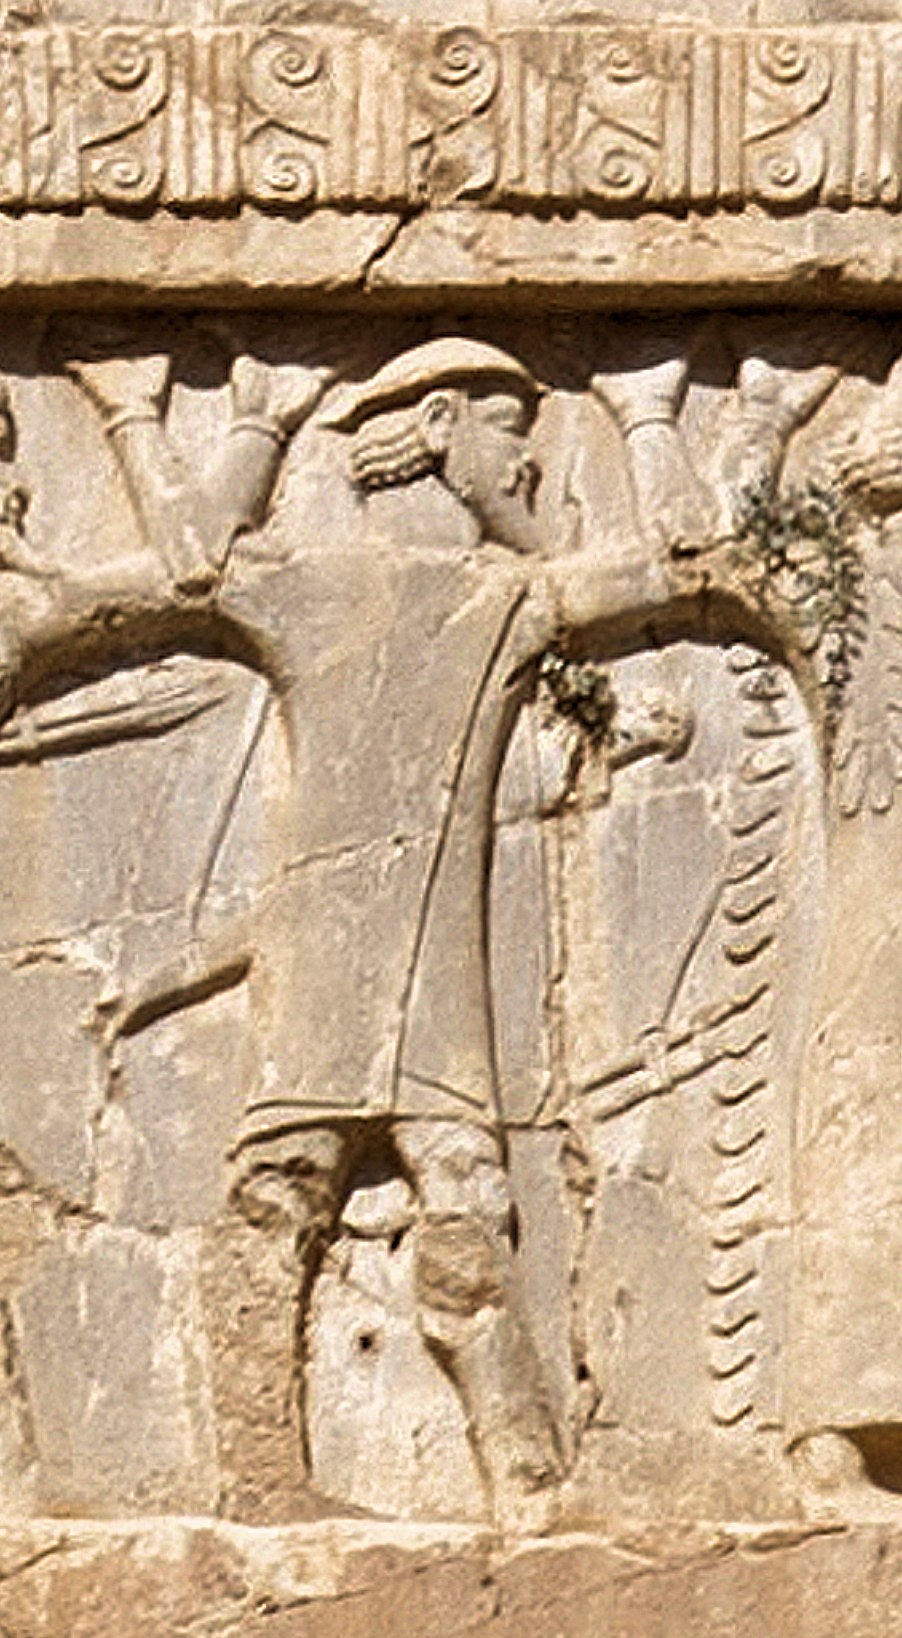 Xerxes I tomb Ionian with petasos or kausia soldier circa 480 BCE